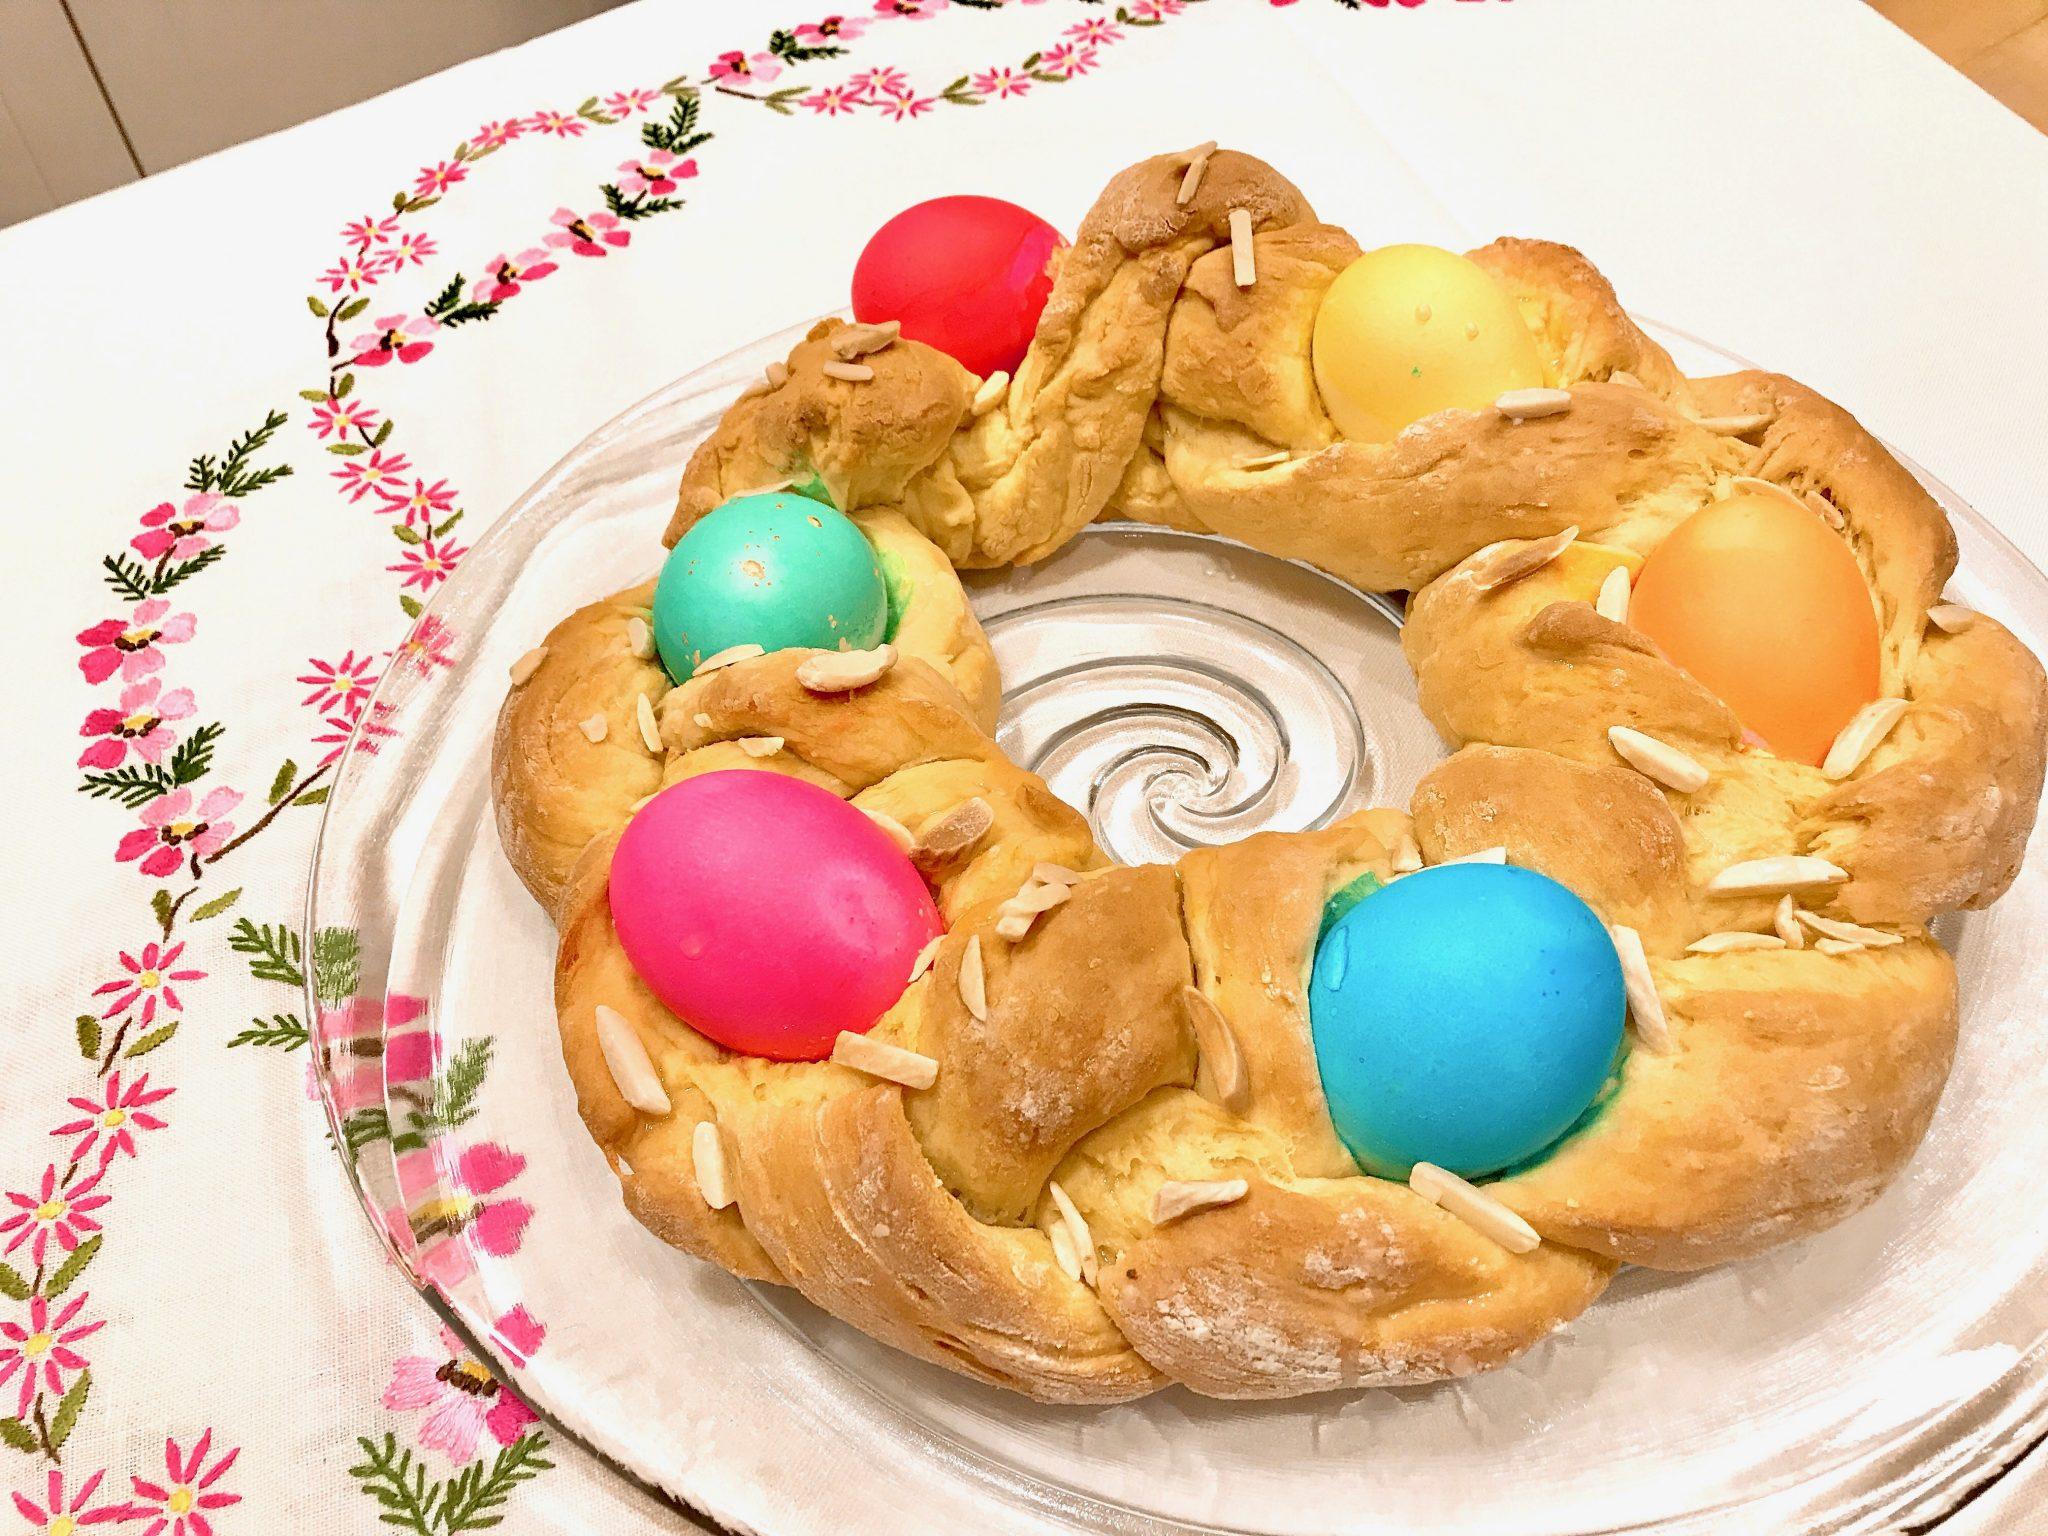 Nana's Recipe for Traditional Italian Easter Bread